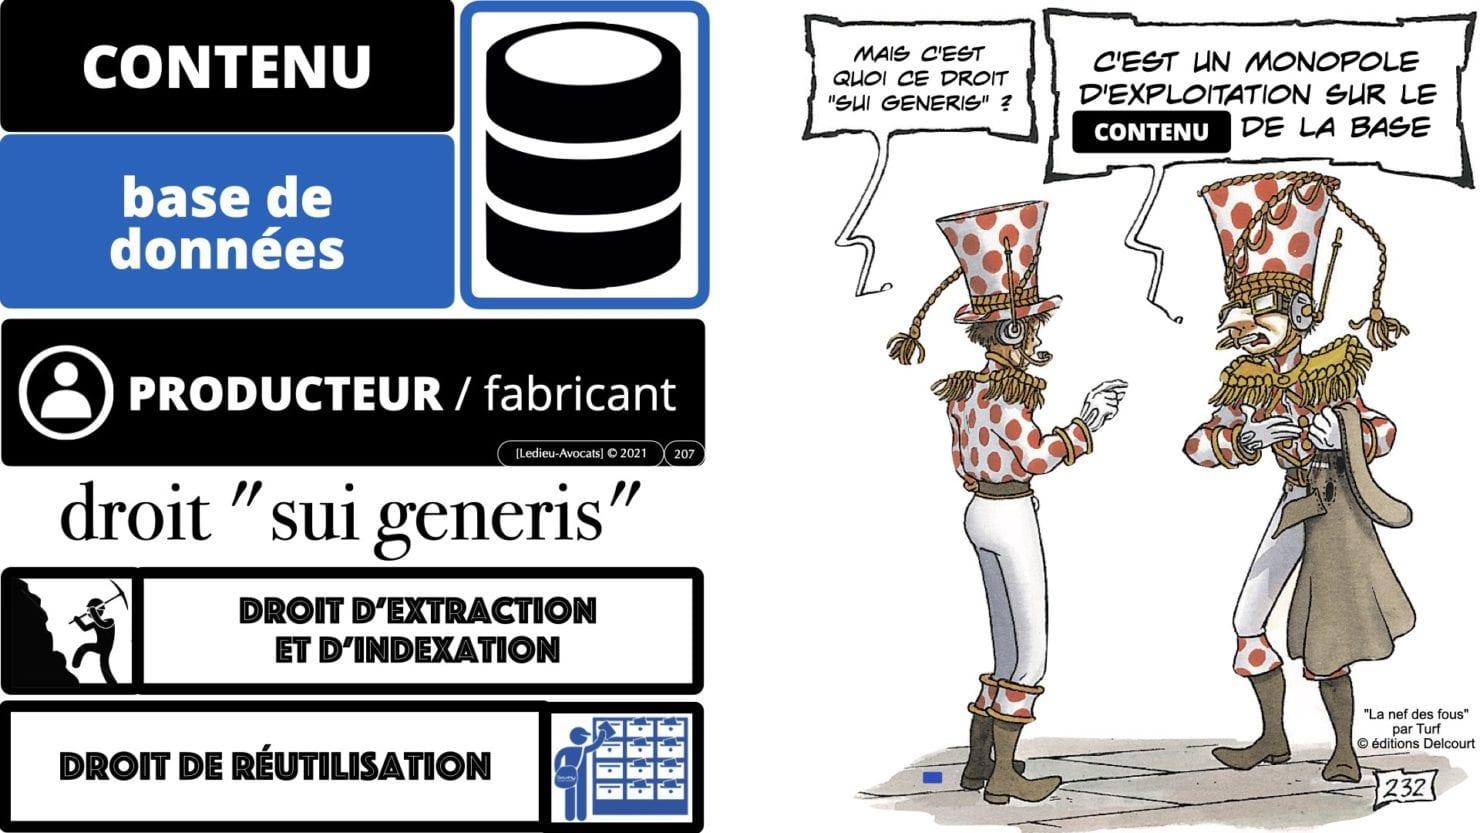 RGPD e-Privacy principes actualité jurisprudence ©Ledieu-Avocats 25-06-2021.207